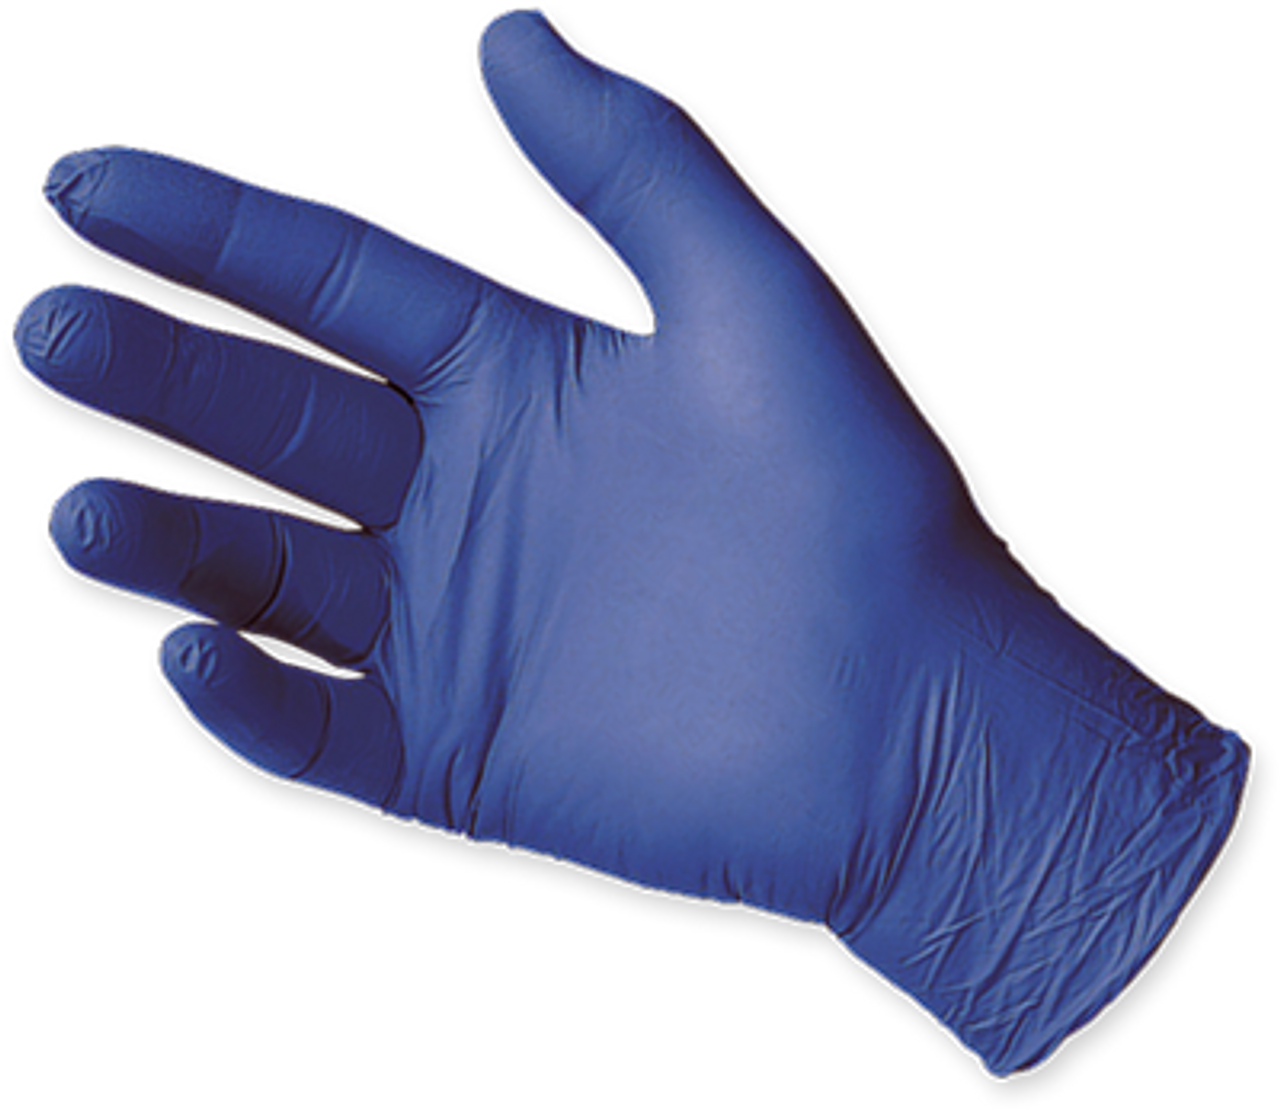 Ultraform PF Nitrile Exam Gloves, $19.99 per 100 gloves, 10 boxes of 300 per case